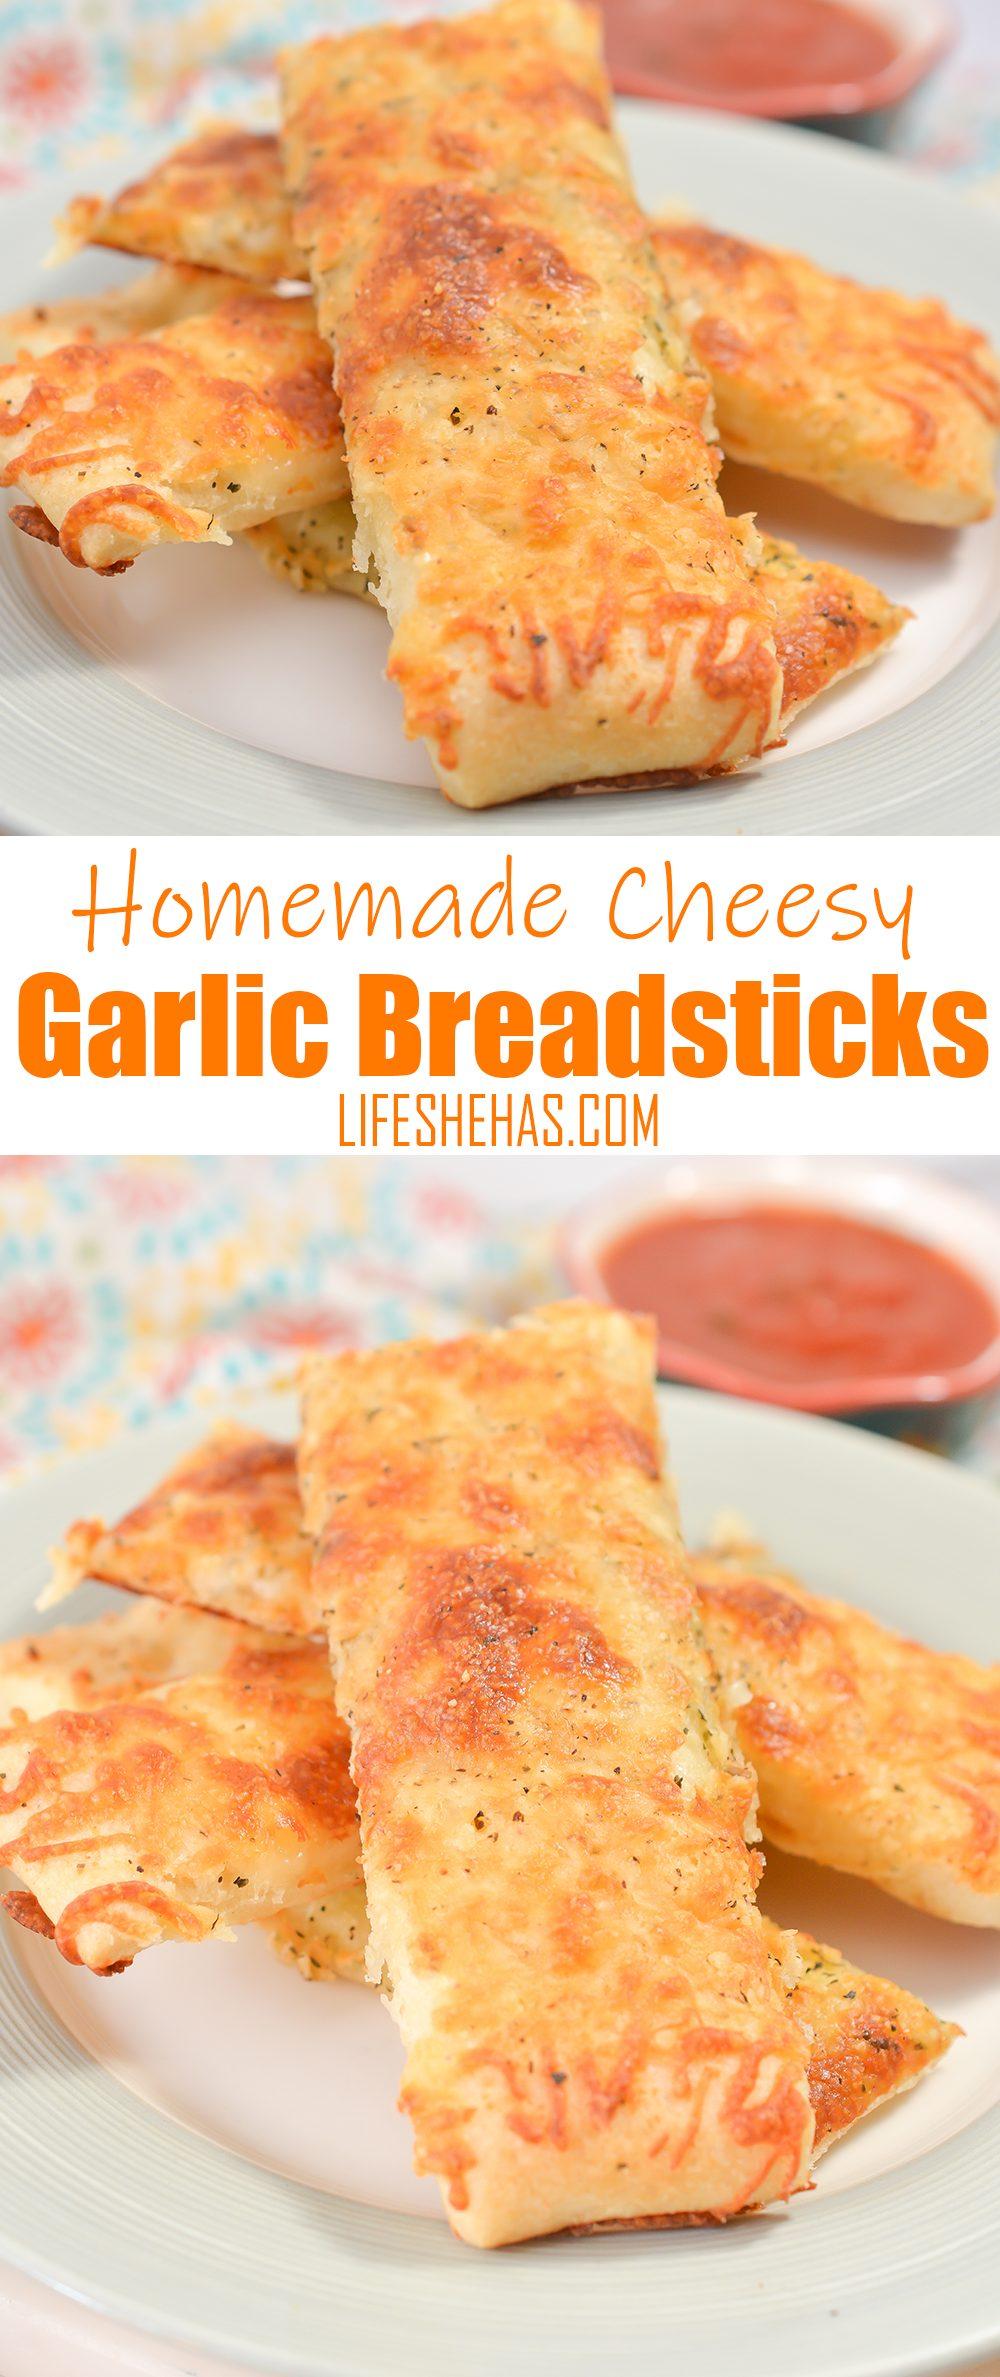 homemade cheesy garlic breadsticks pinterest pin template